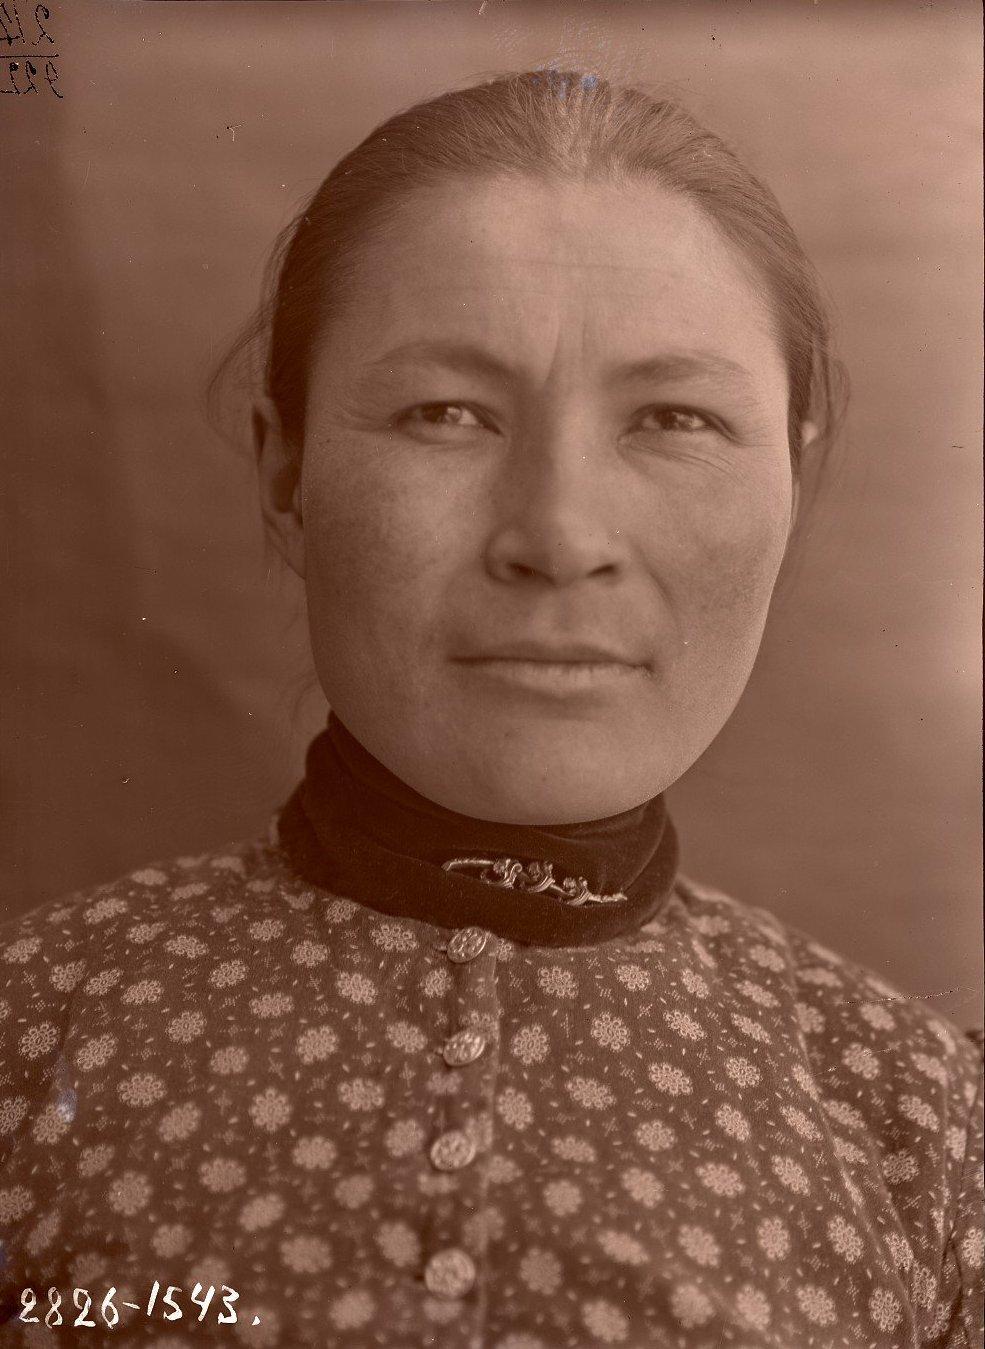 1909. Алеутка Васса Черкашина (фас), Алеутские острова, Умнак остров